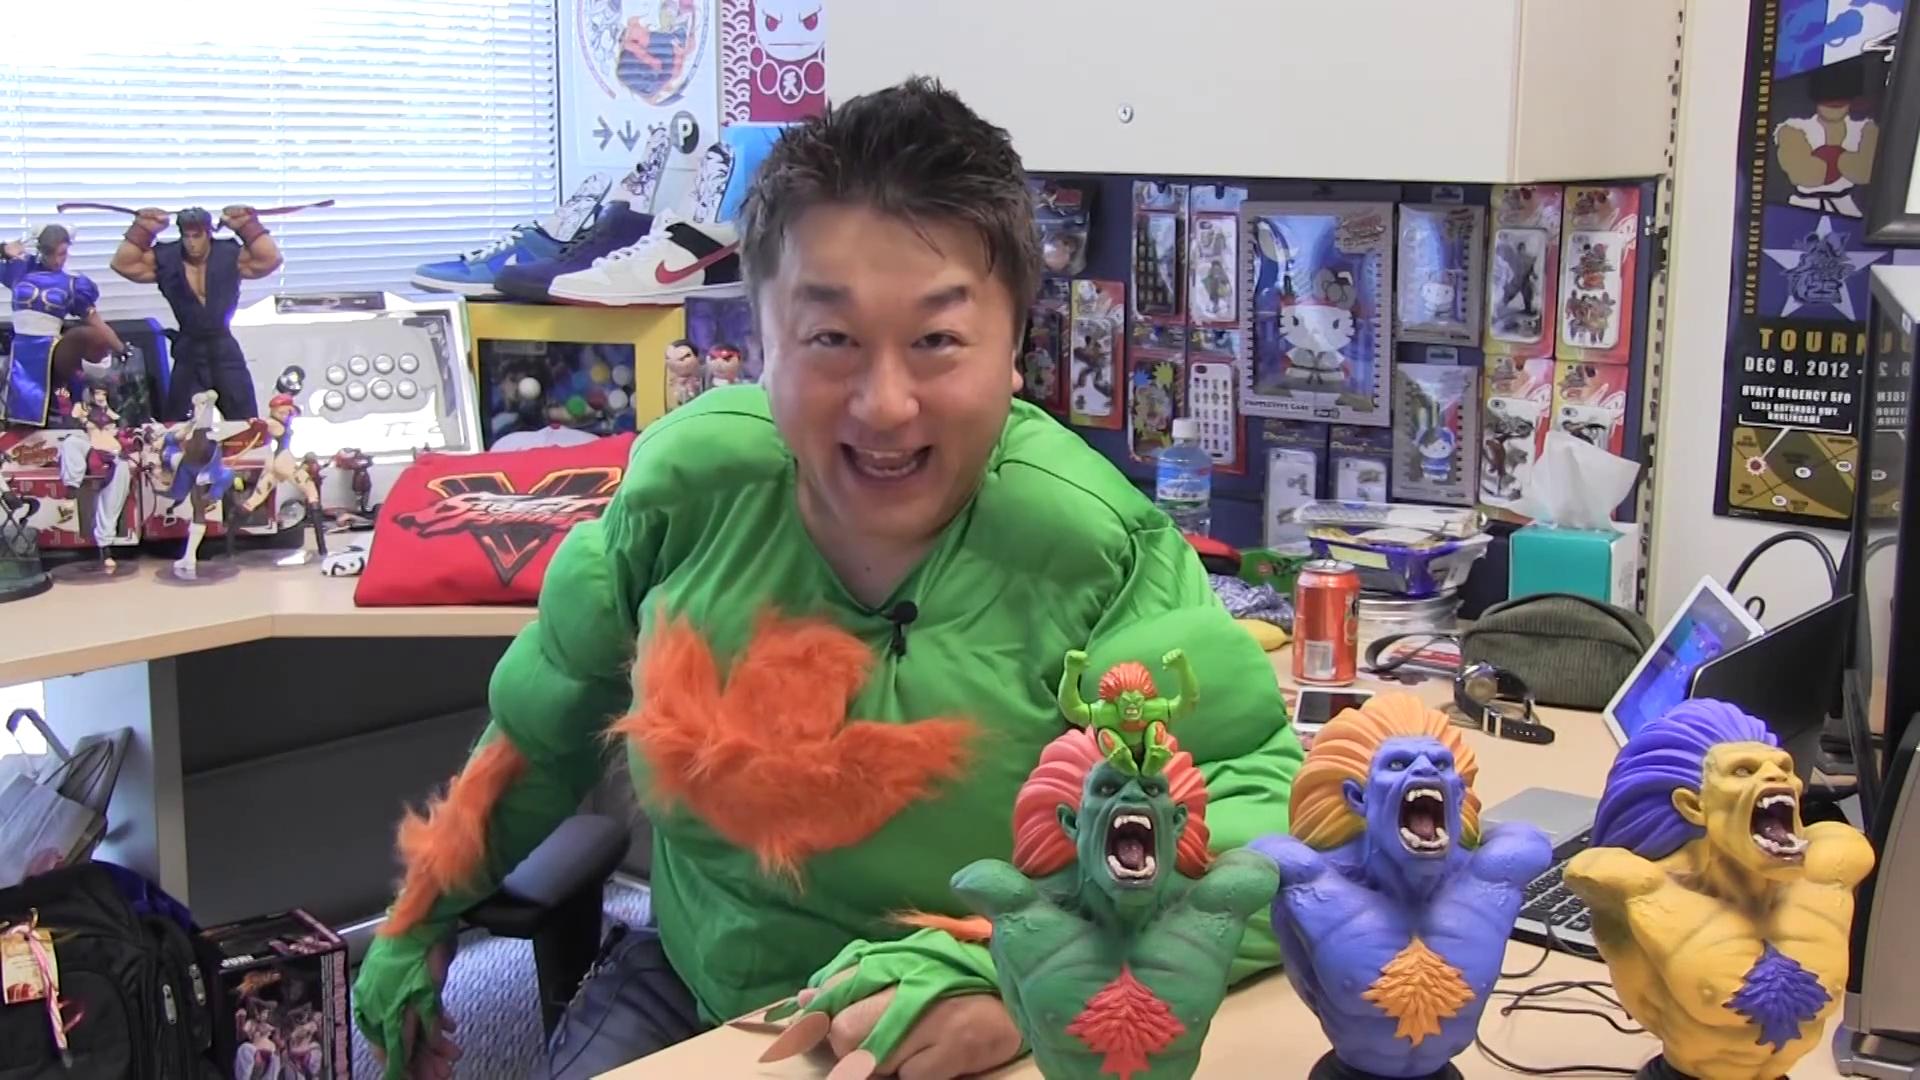 Confirmado: Yoshinori Ono participará como invitado en FestiGame Fanta Zero 2016